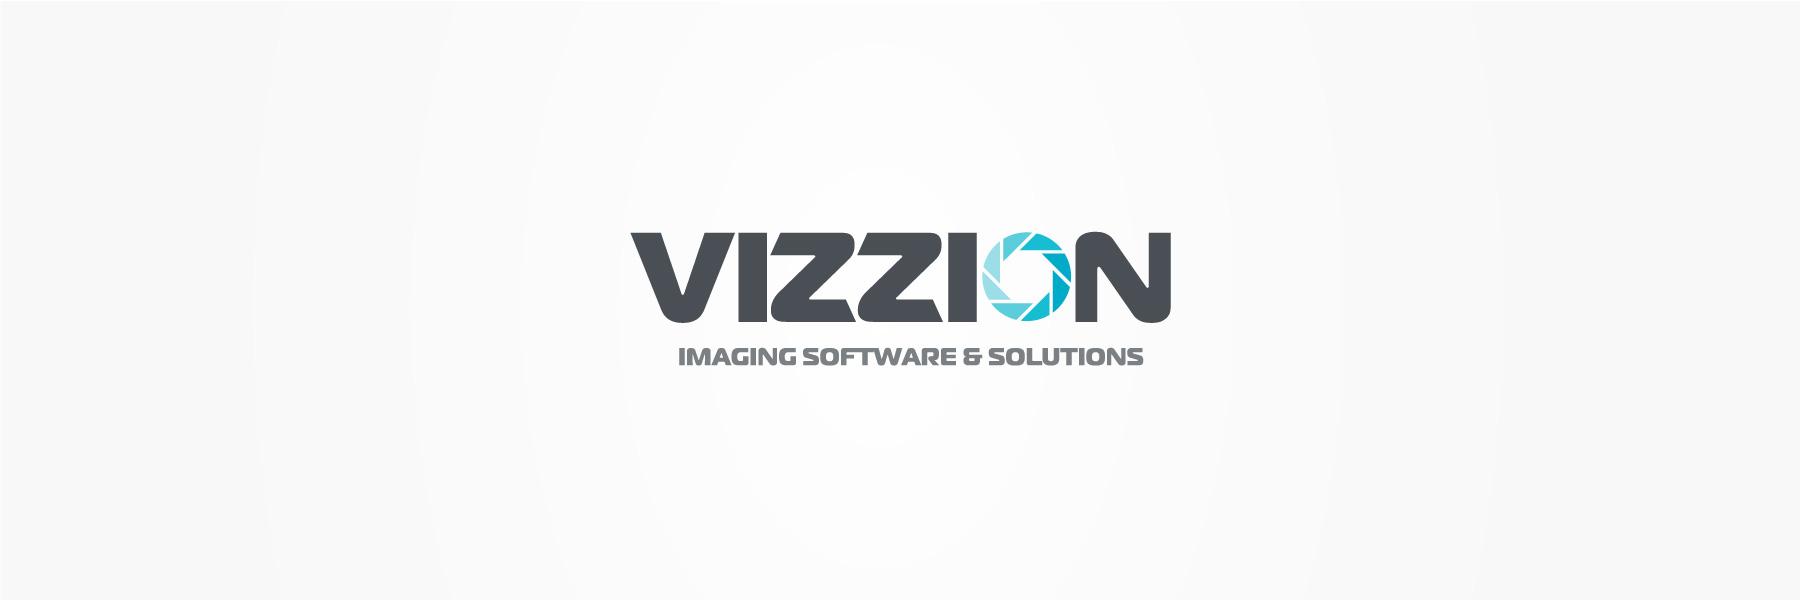 Vizzion-Logo-Design